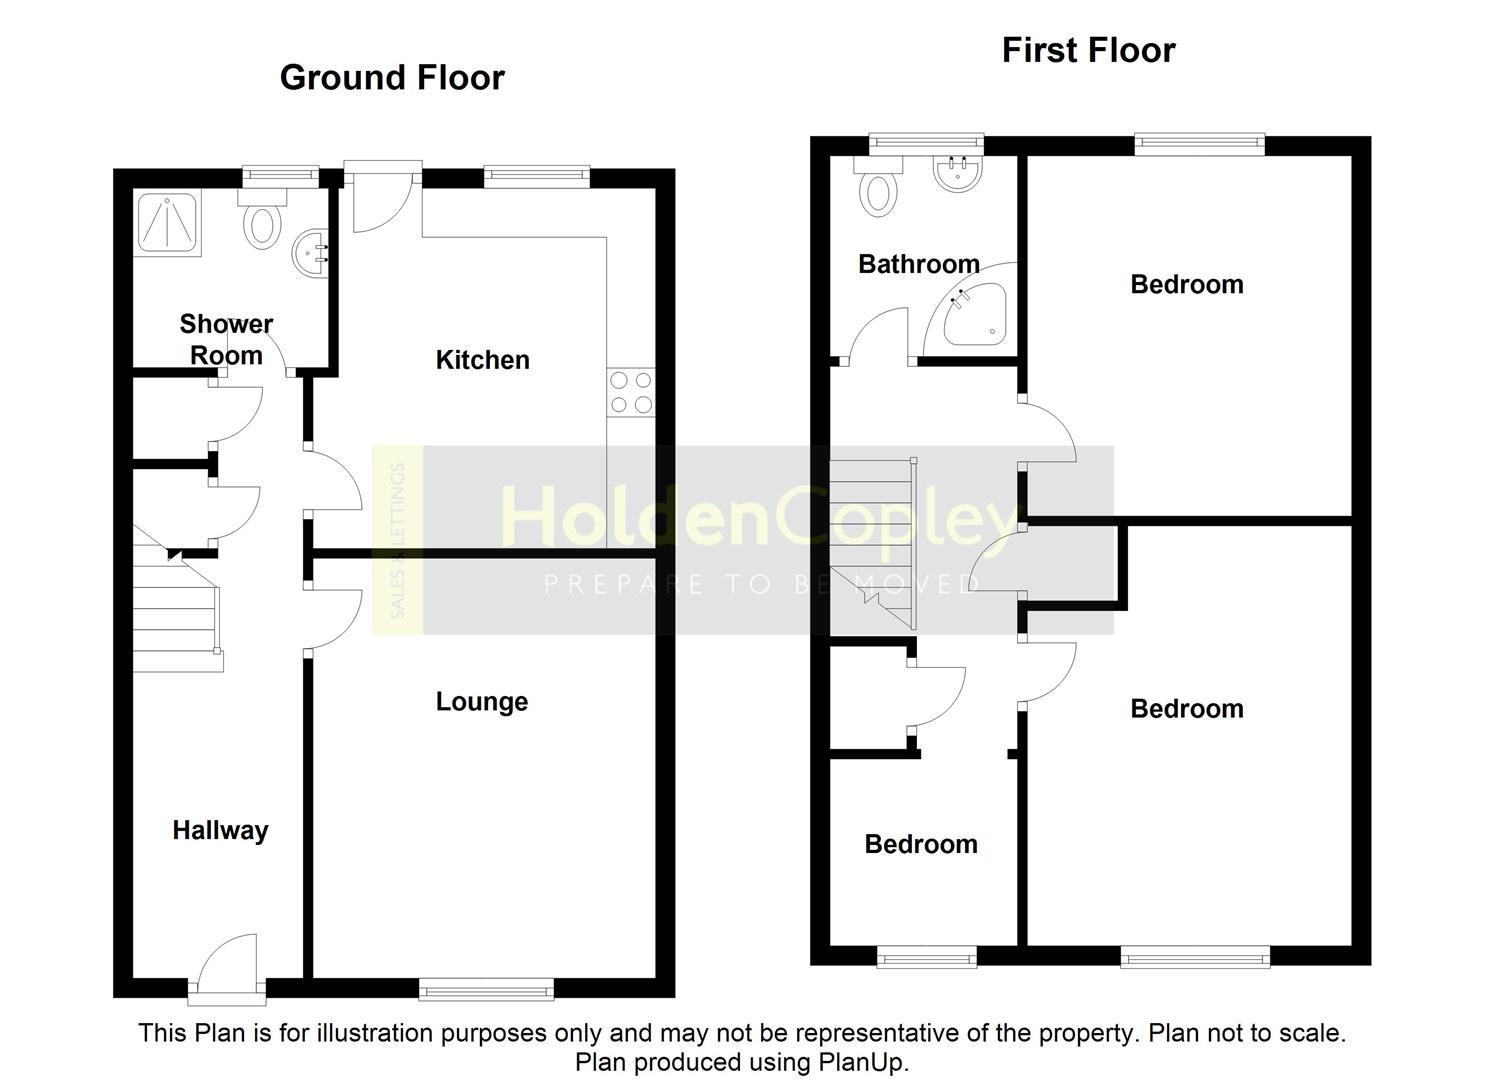 Rolleston drive arnold nottingham ng5 3 bedroom semi for Food bar rolleston